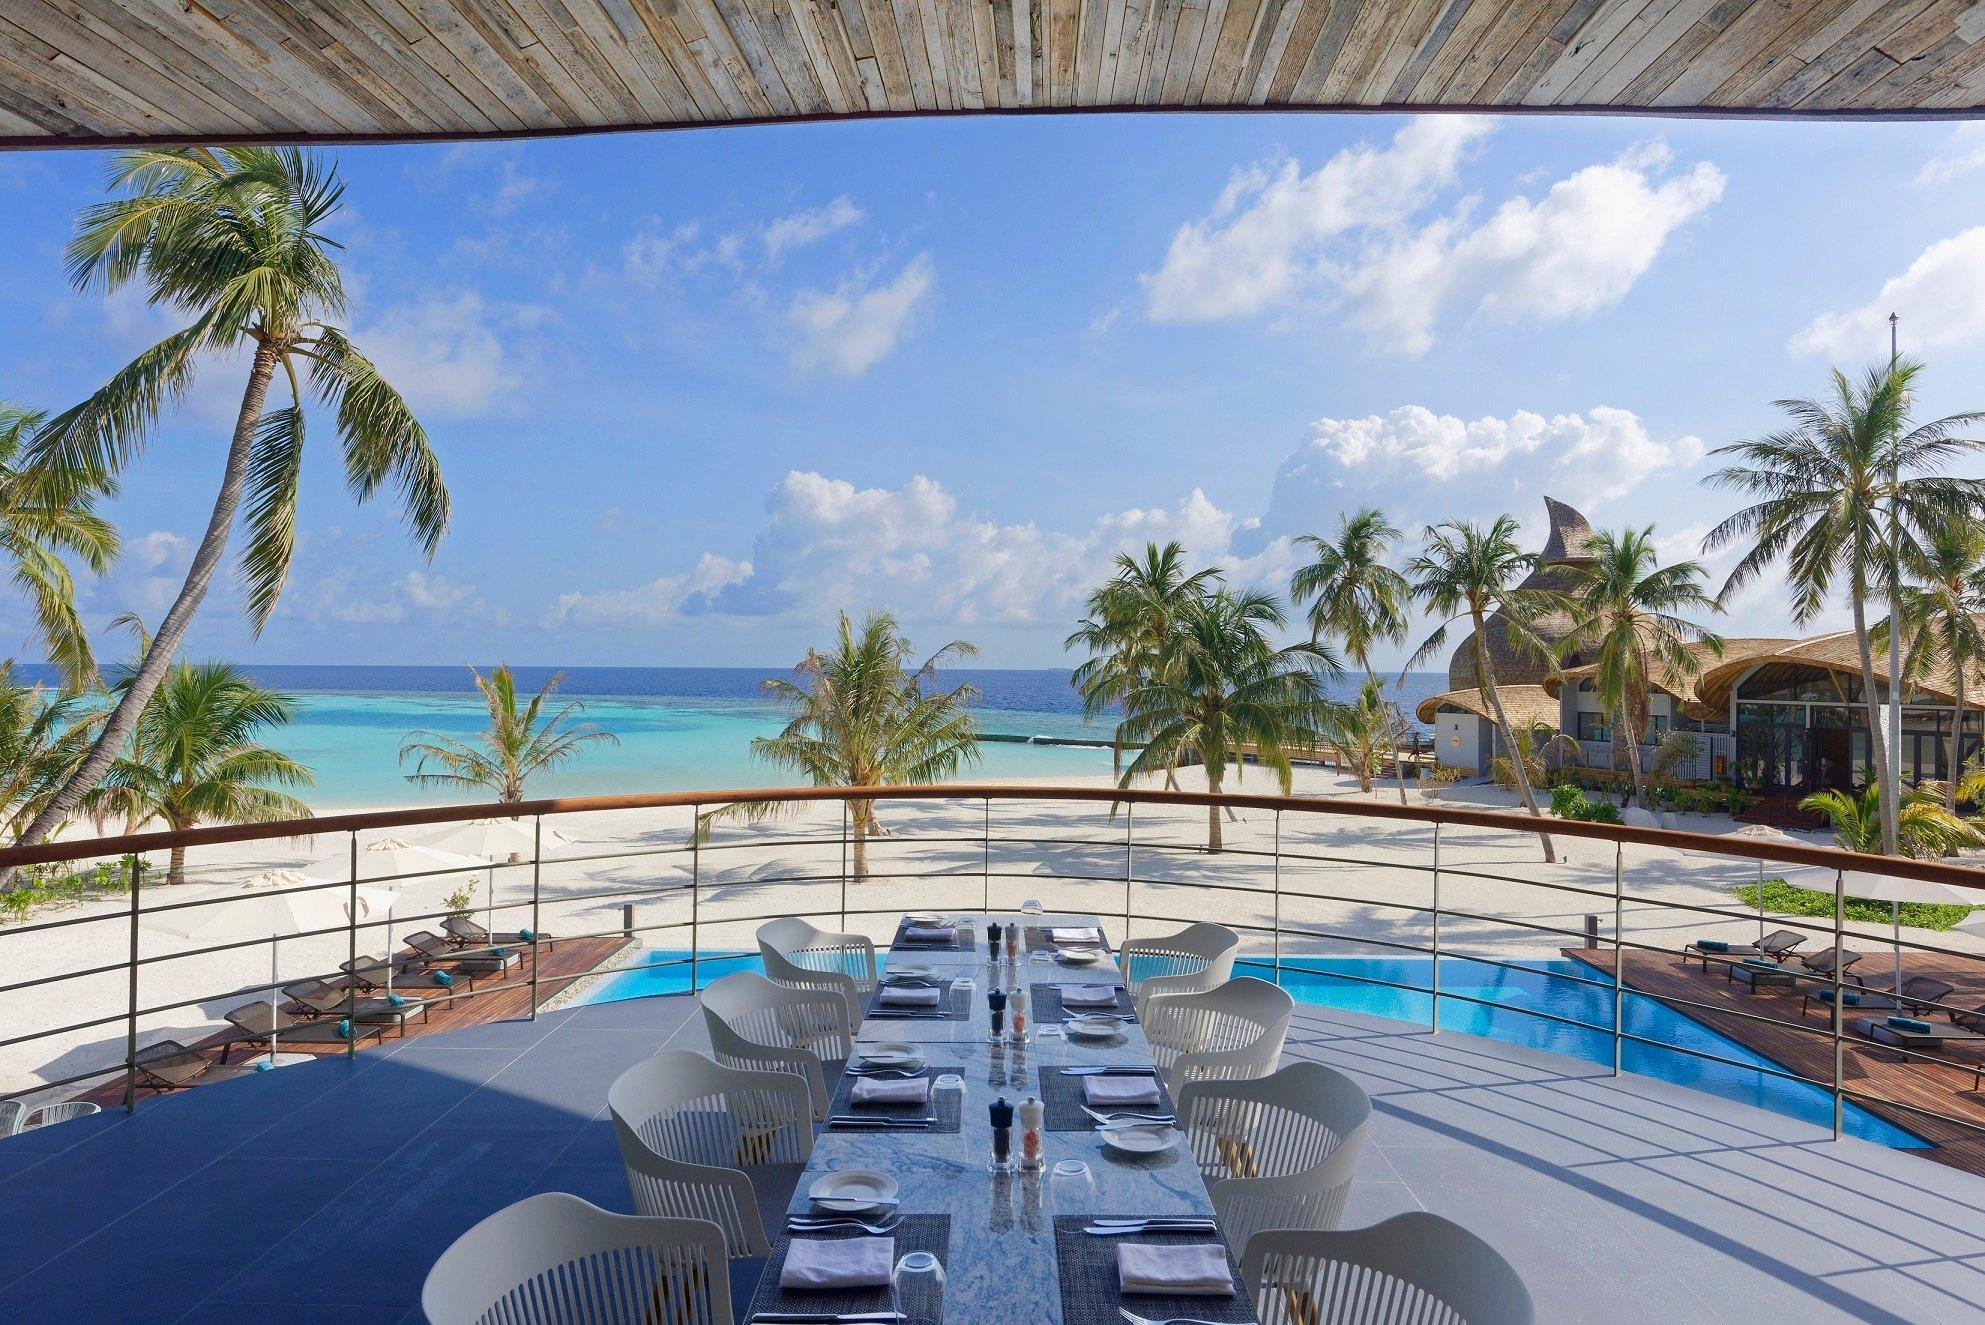 maafushivaru-island-resort-genel-009